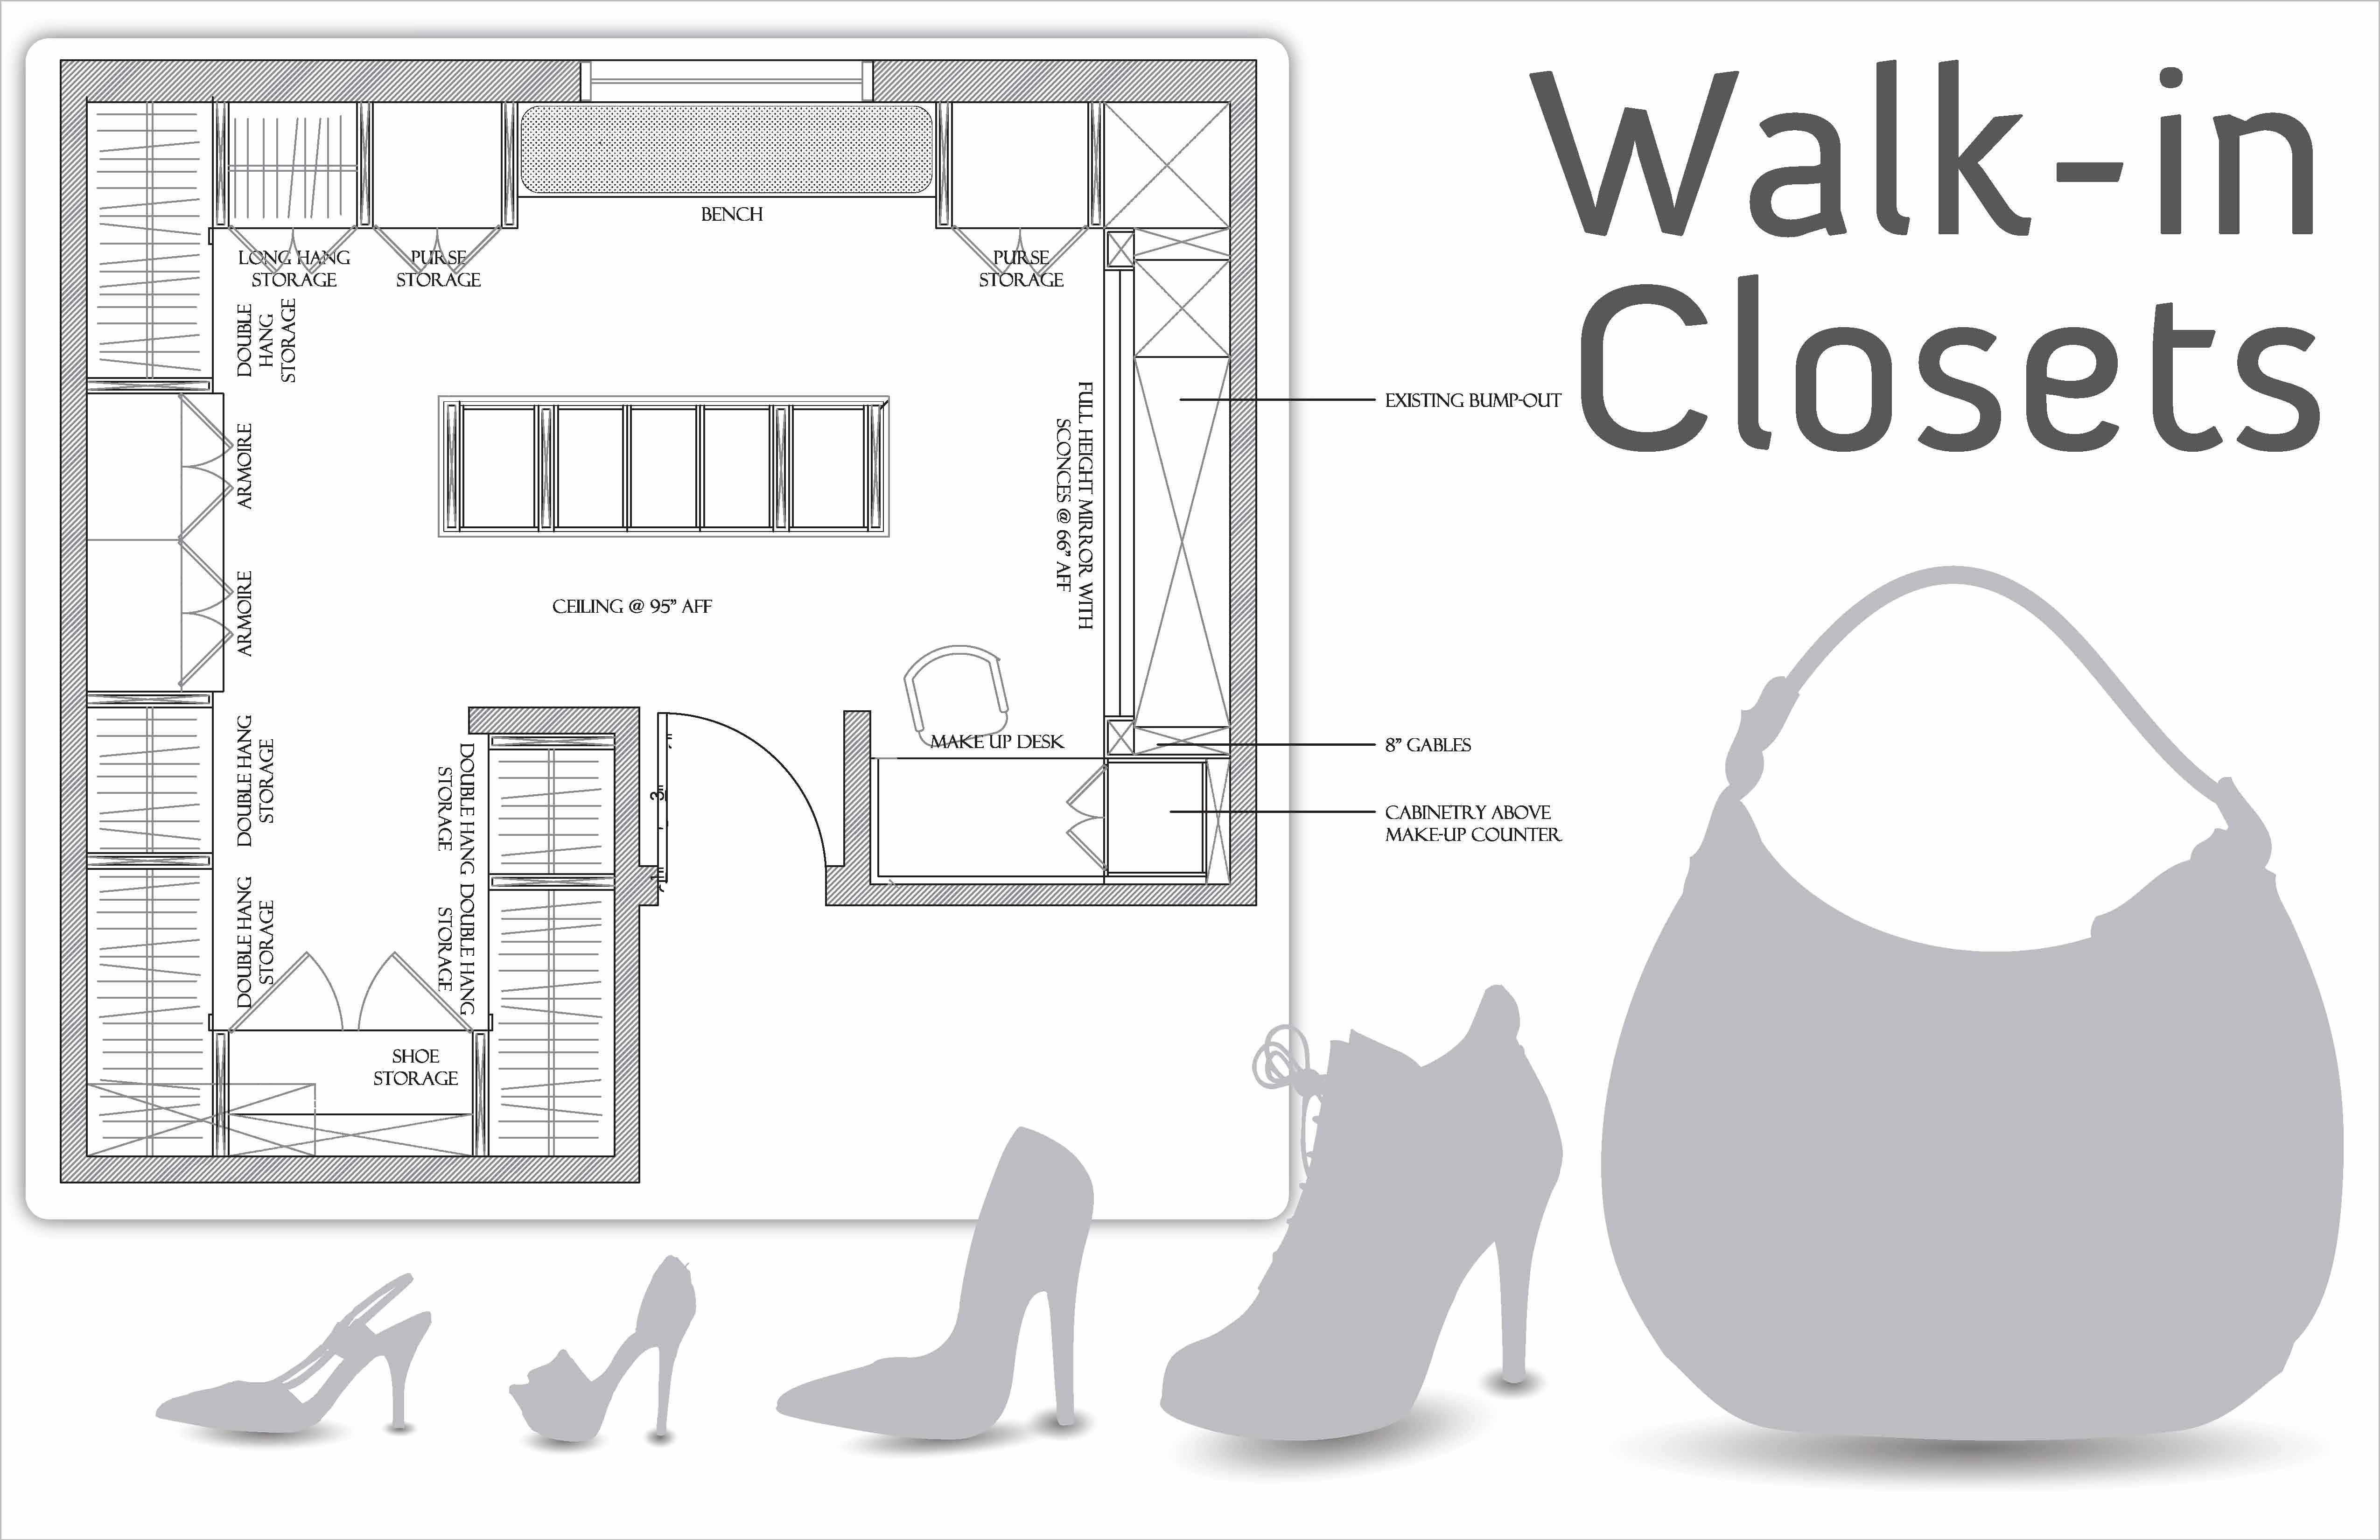 Minimum Bedroom Closet Depth Walk In Closet Dimensions Closet Layout Walk In Closet